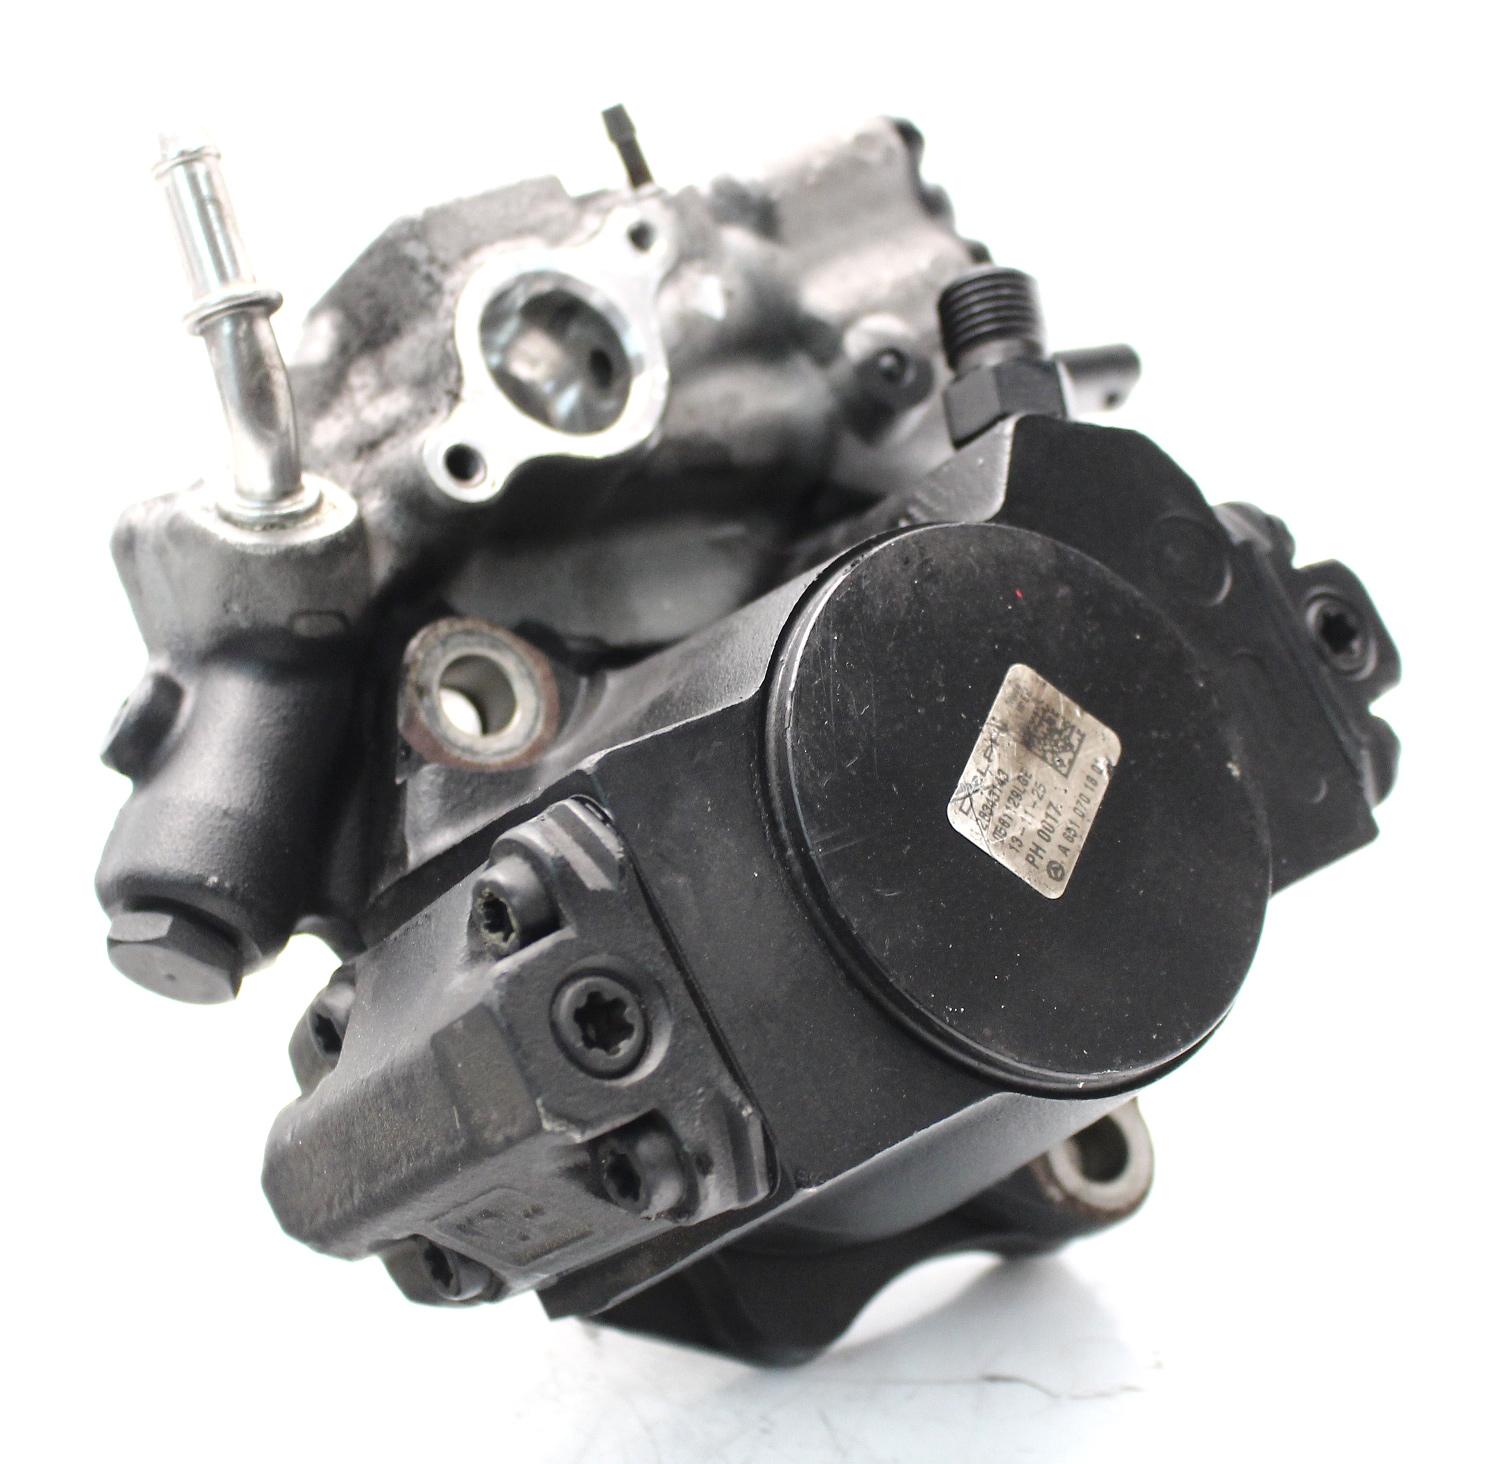 Hochdruckpumpe Mercedes Benz 2,2 CDI OM651 A6510700301 A6510700001 28447439 DE329398